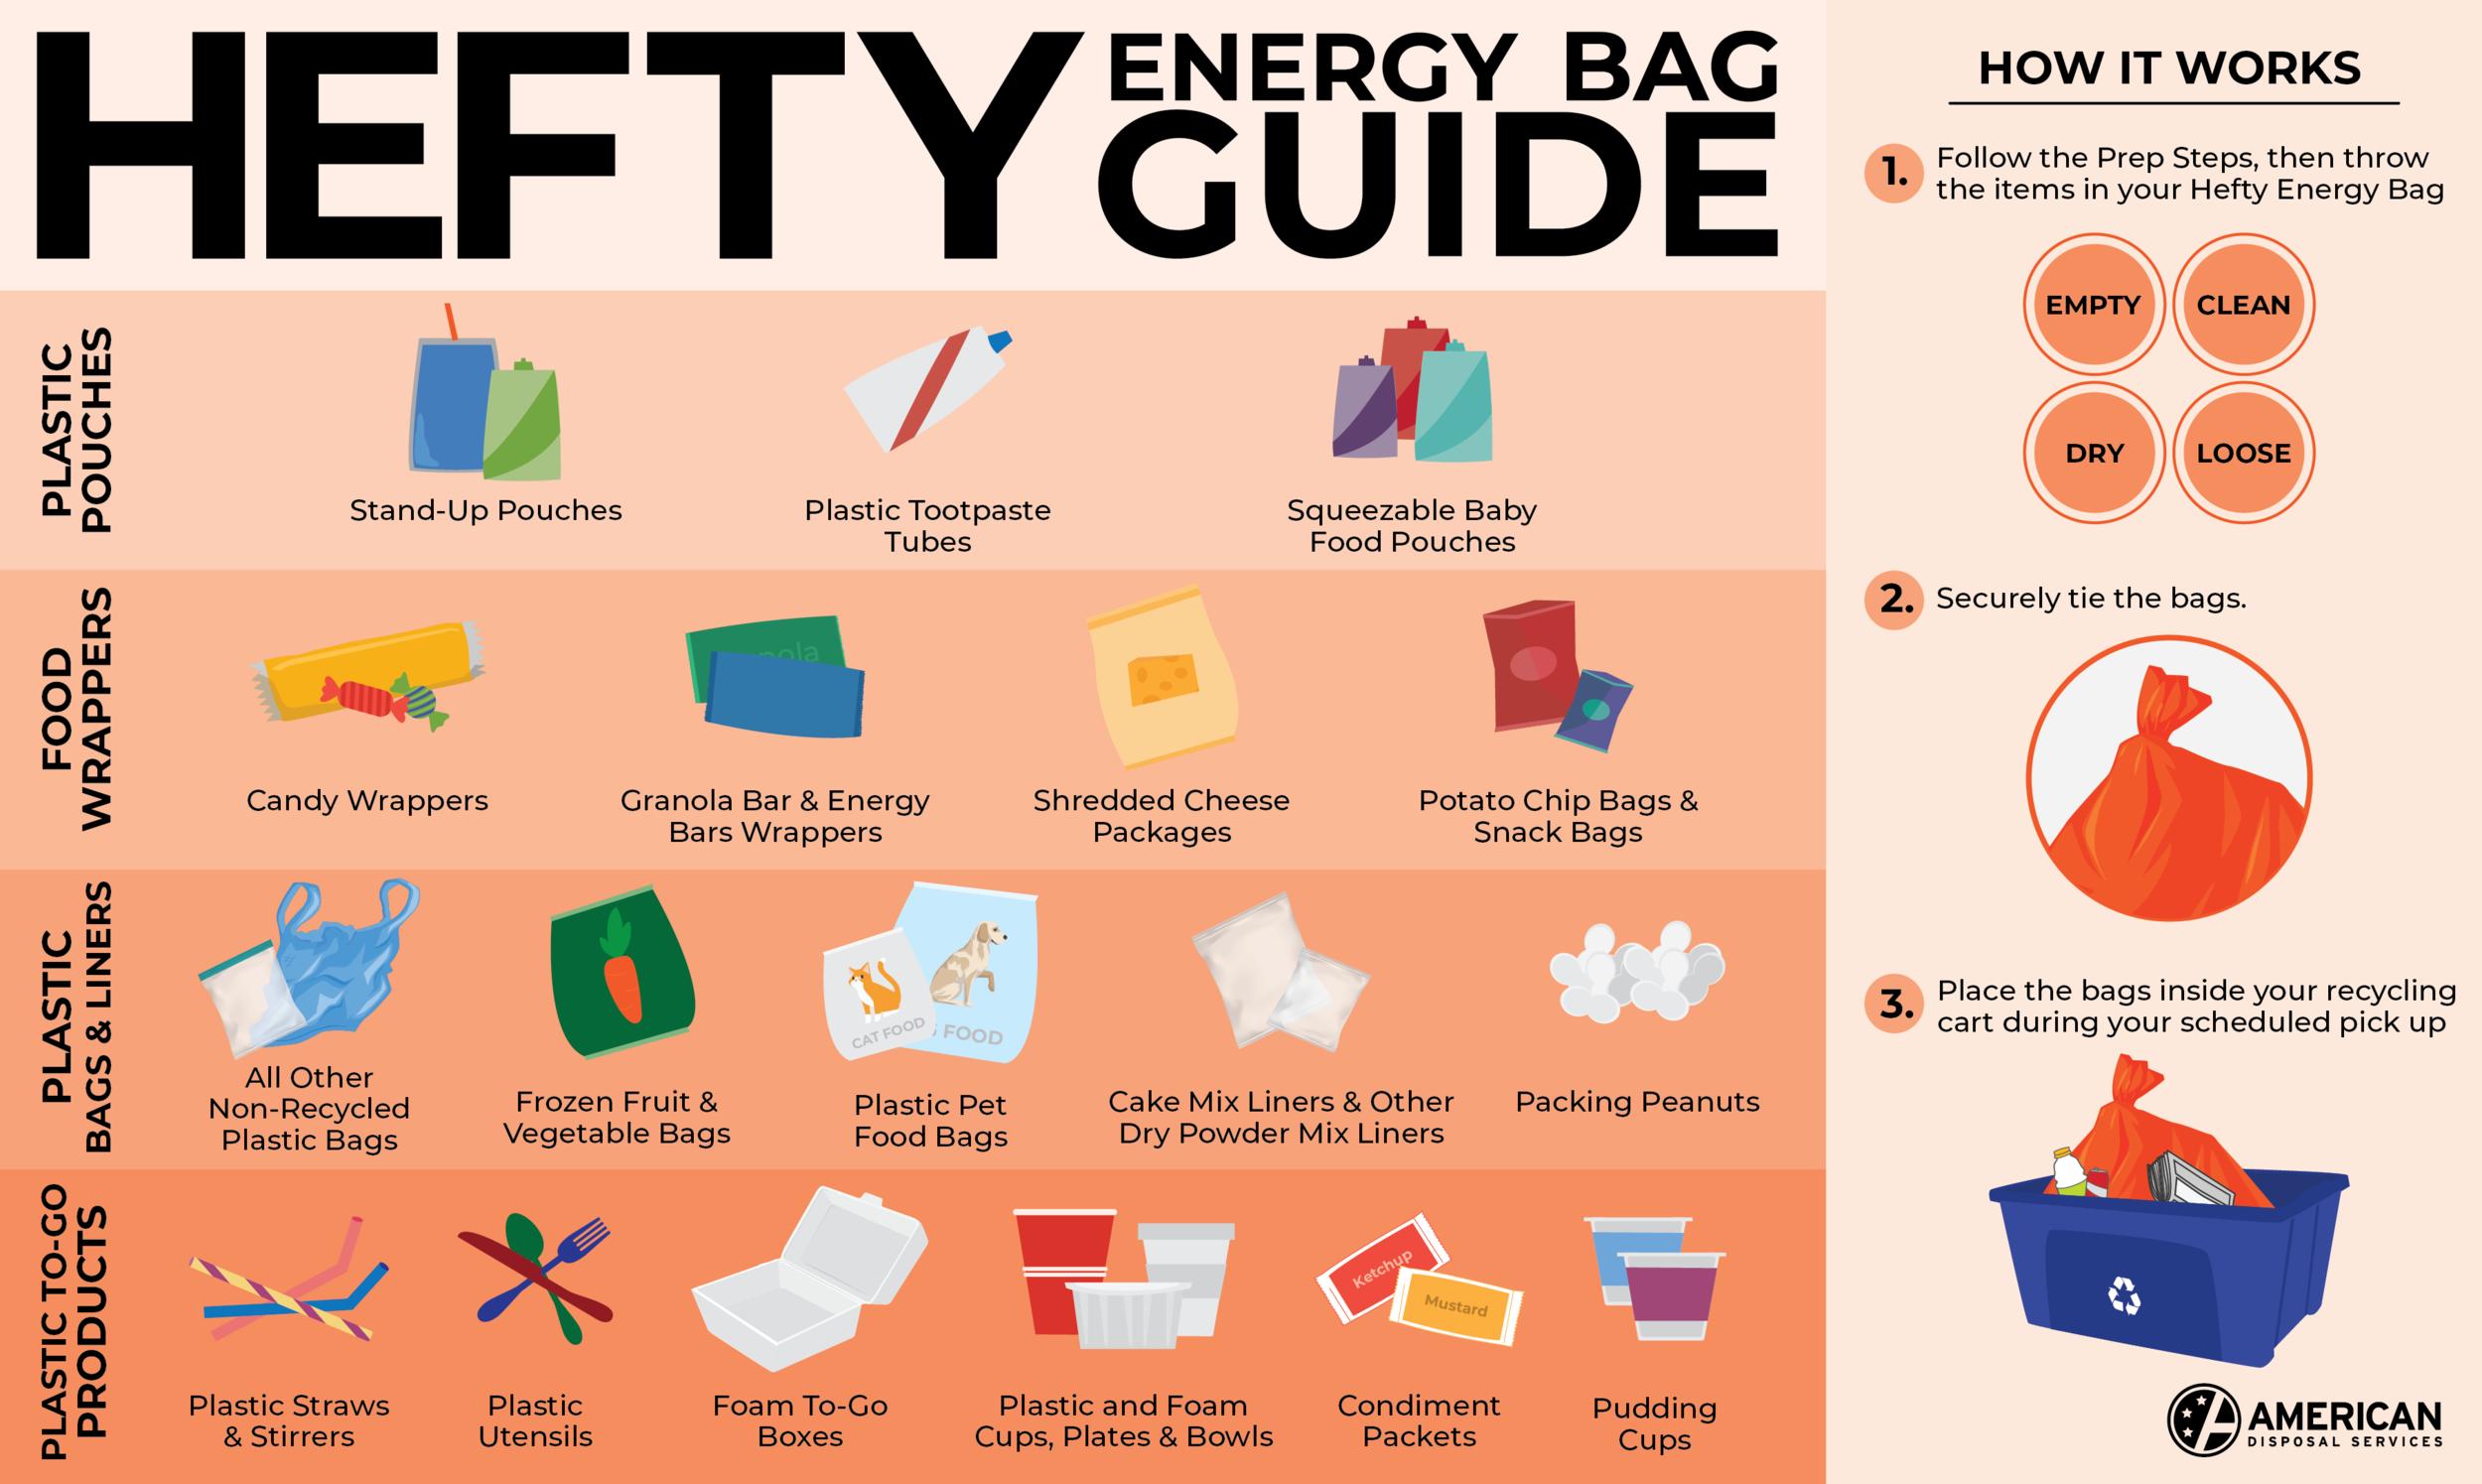 hefty-energy-bag-guide.png